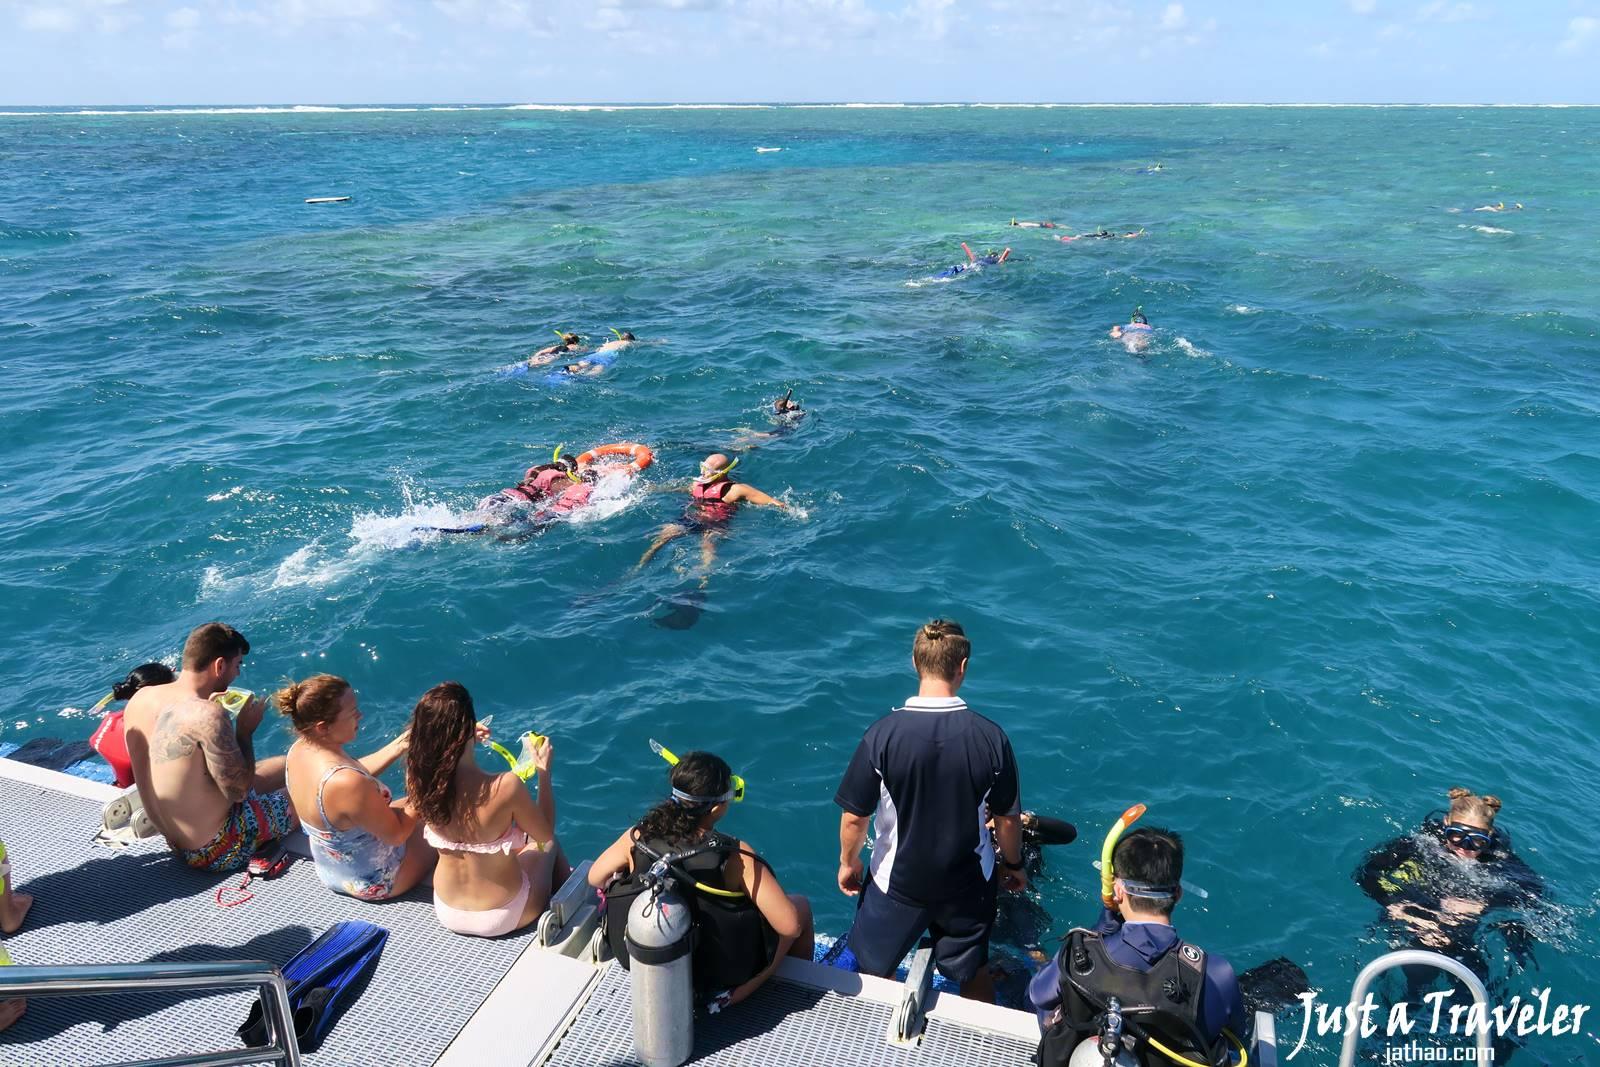 凱恩斯-大堡礁-外堡礁-推薦-公司-旅遊-潛水-浮潛-自由行-澳洲-Cairns-Outer-Great-Barrier-Reef-Snorkel-Diving-Travel-Australia